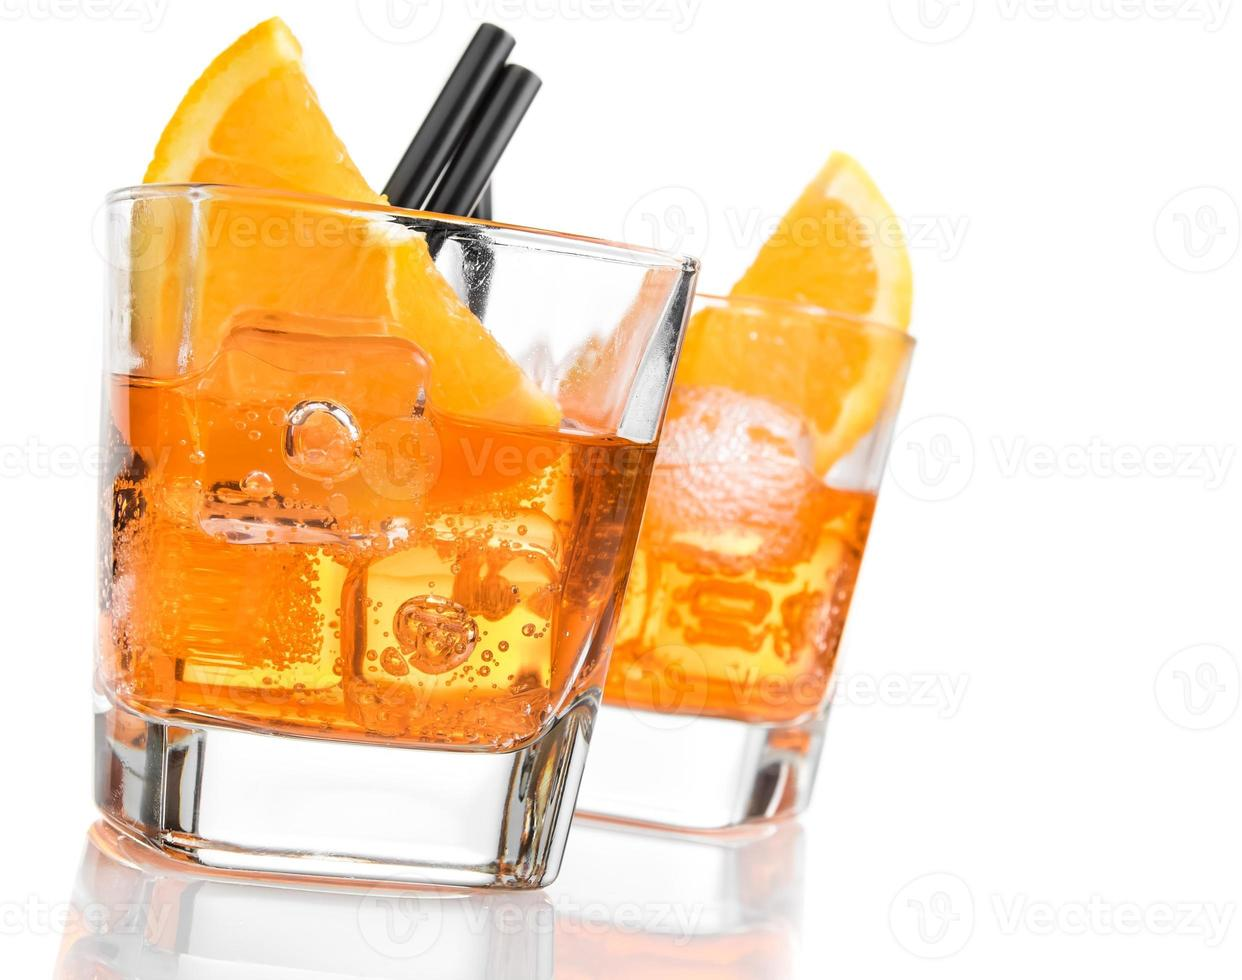 detalhe de copos de spritz aperitivo aperol cocktail foto